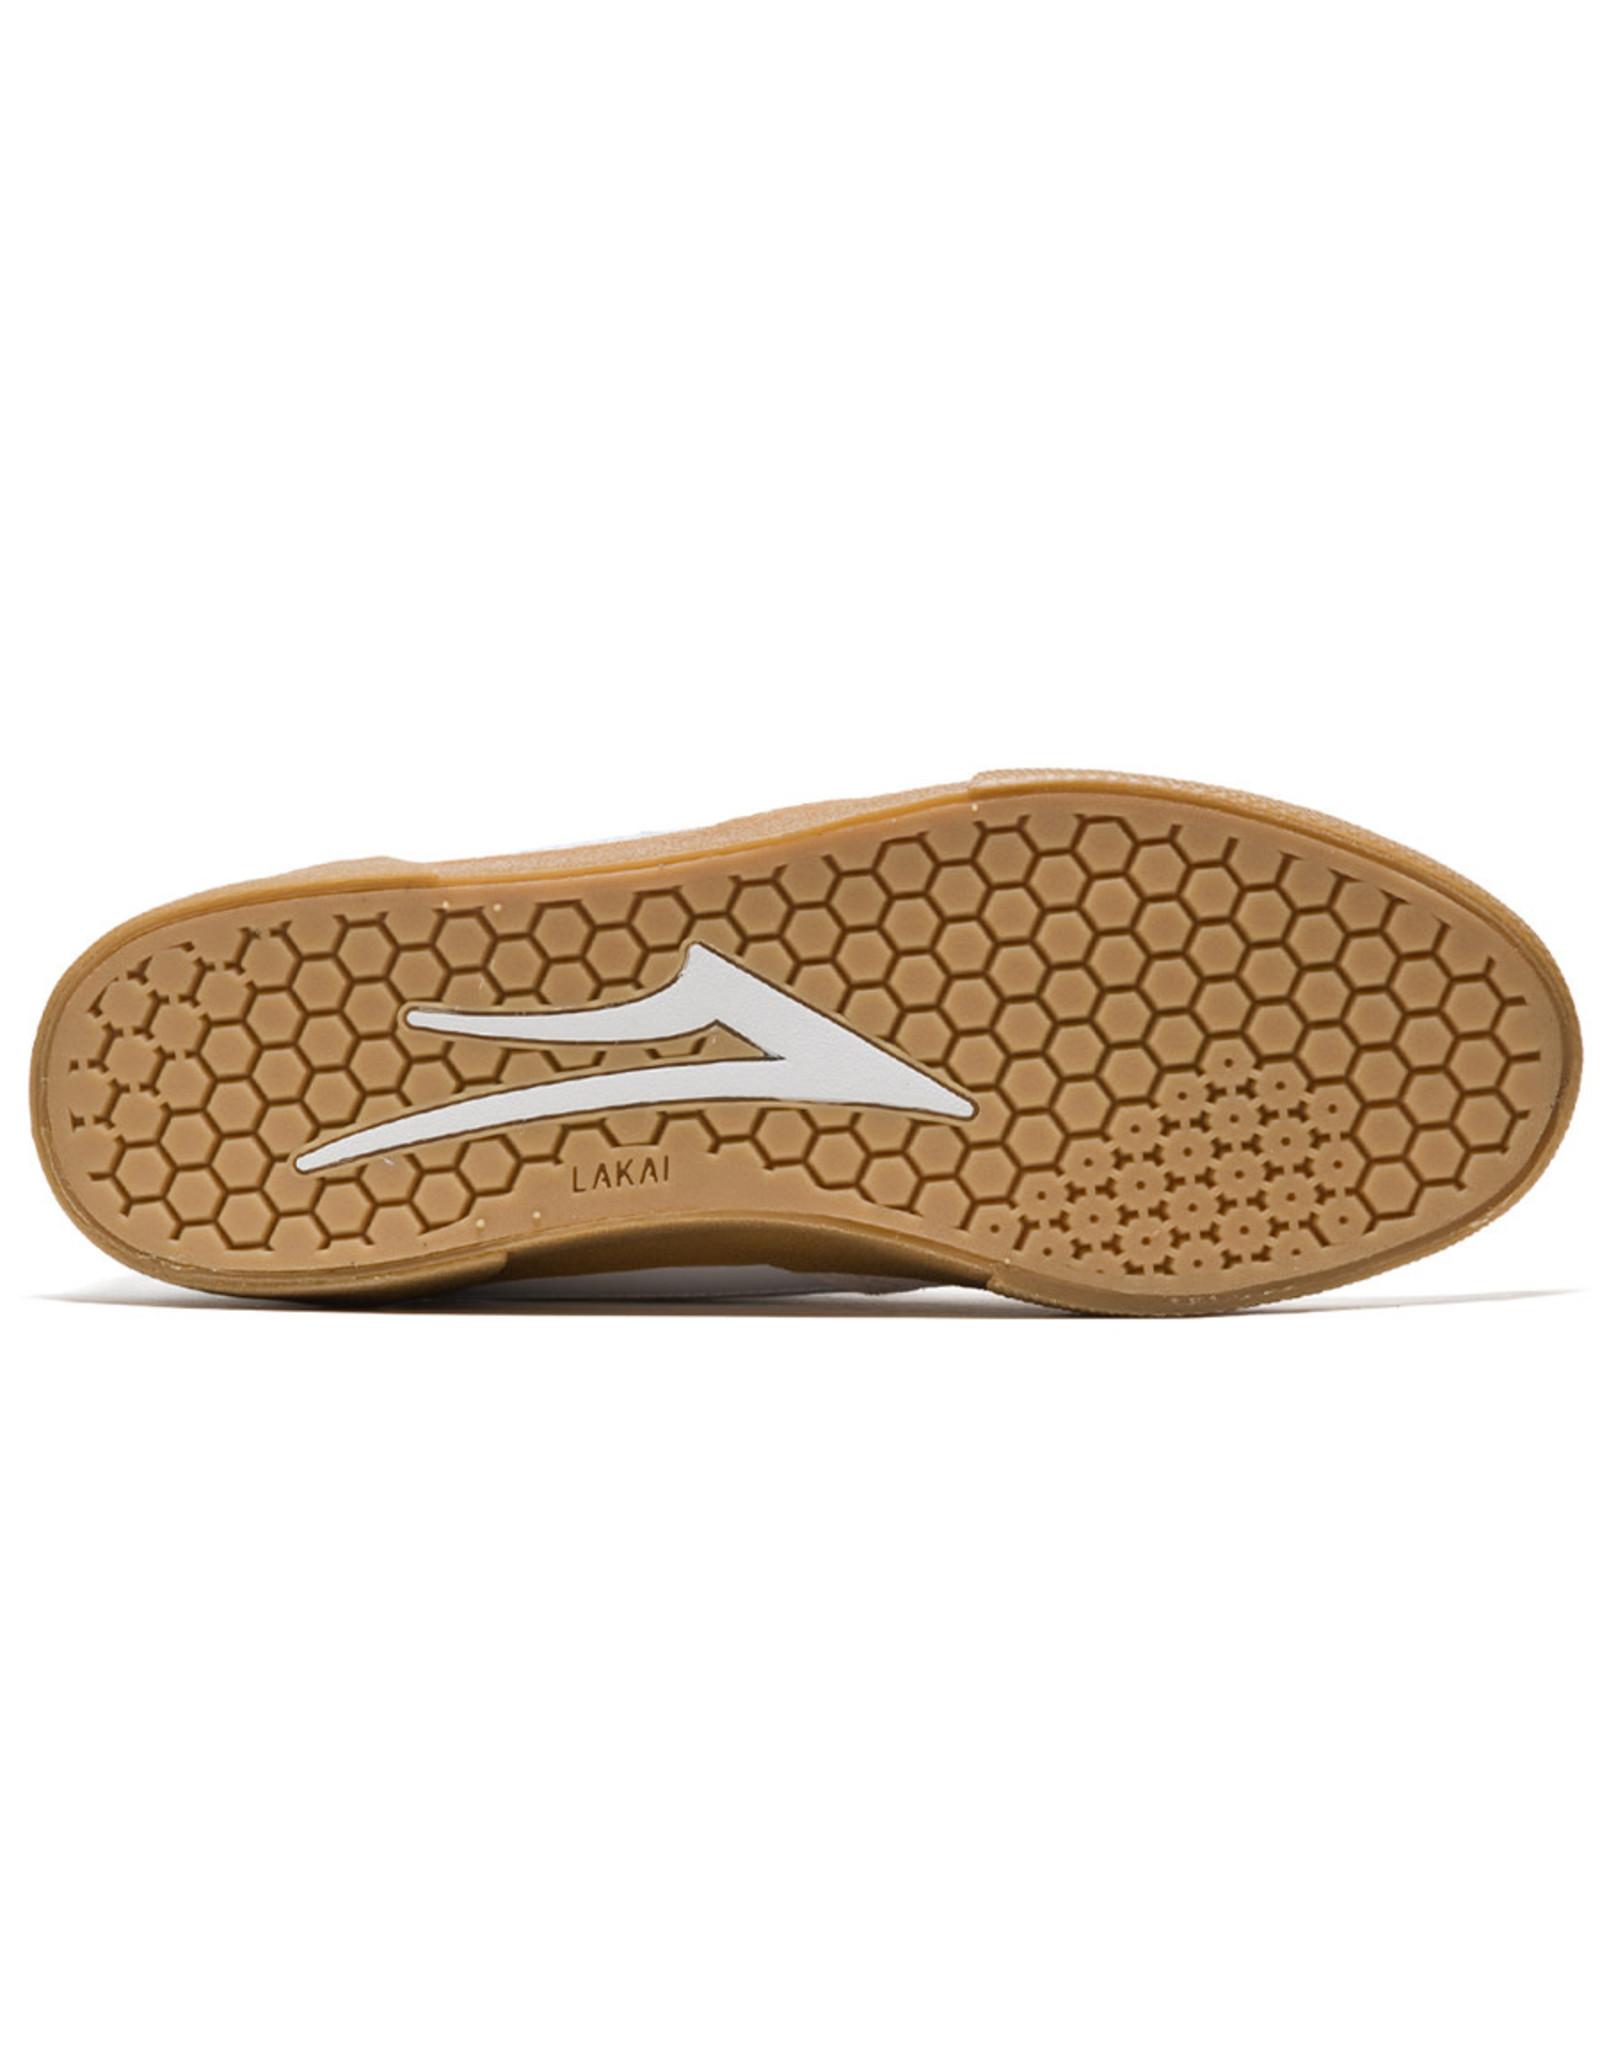 Lakai Shoes Lakai Shoe Cambridge (White/Gum Suede)